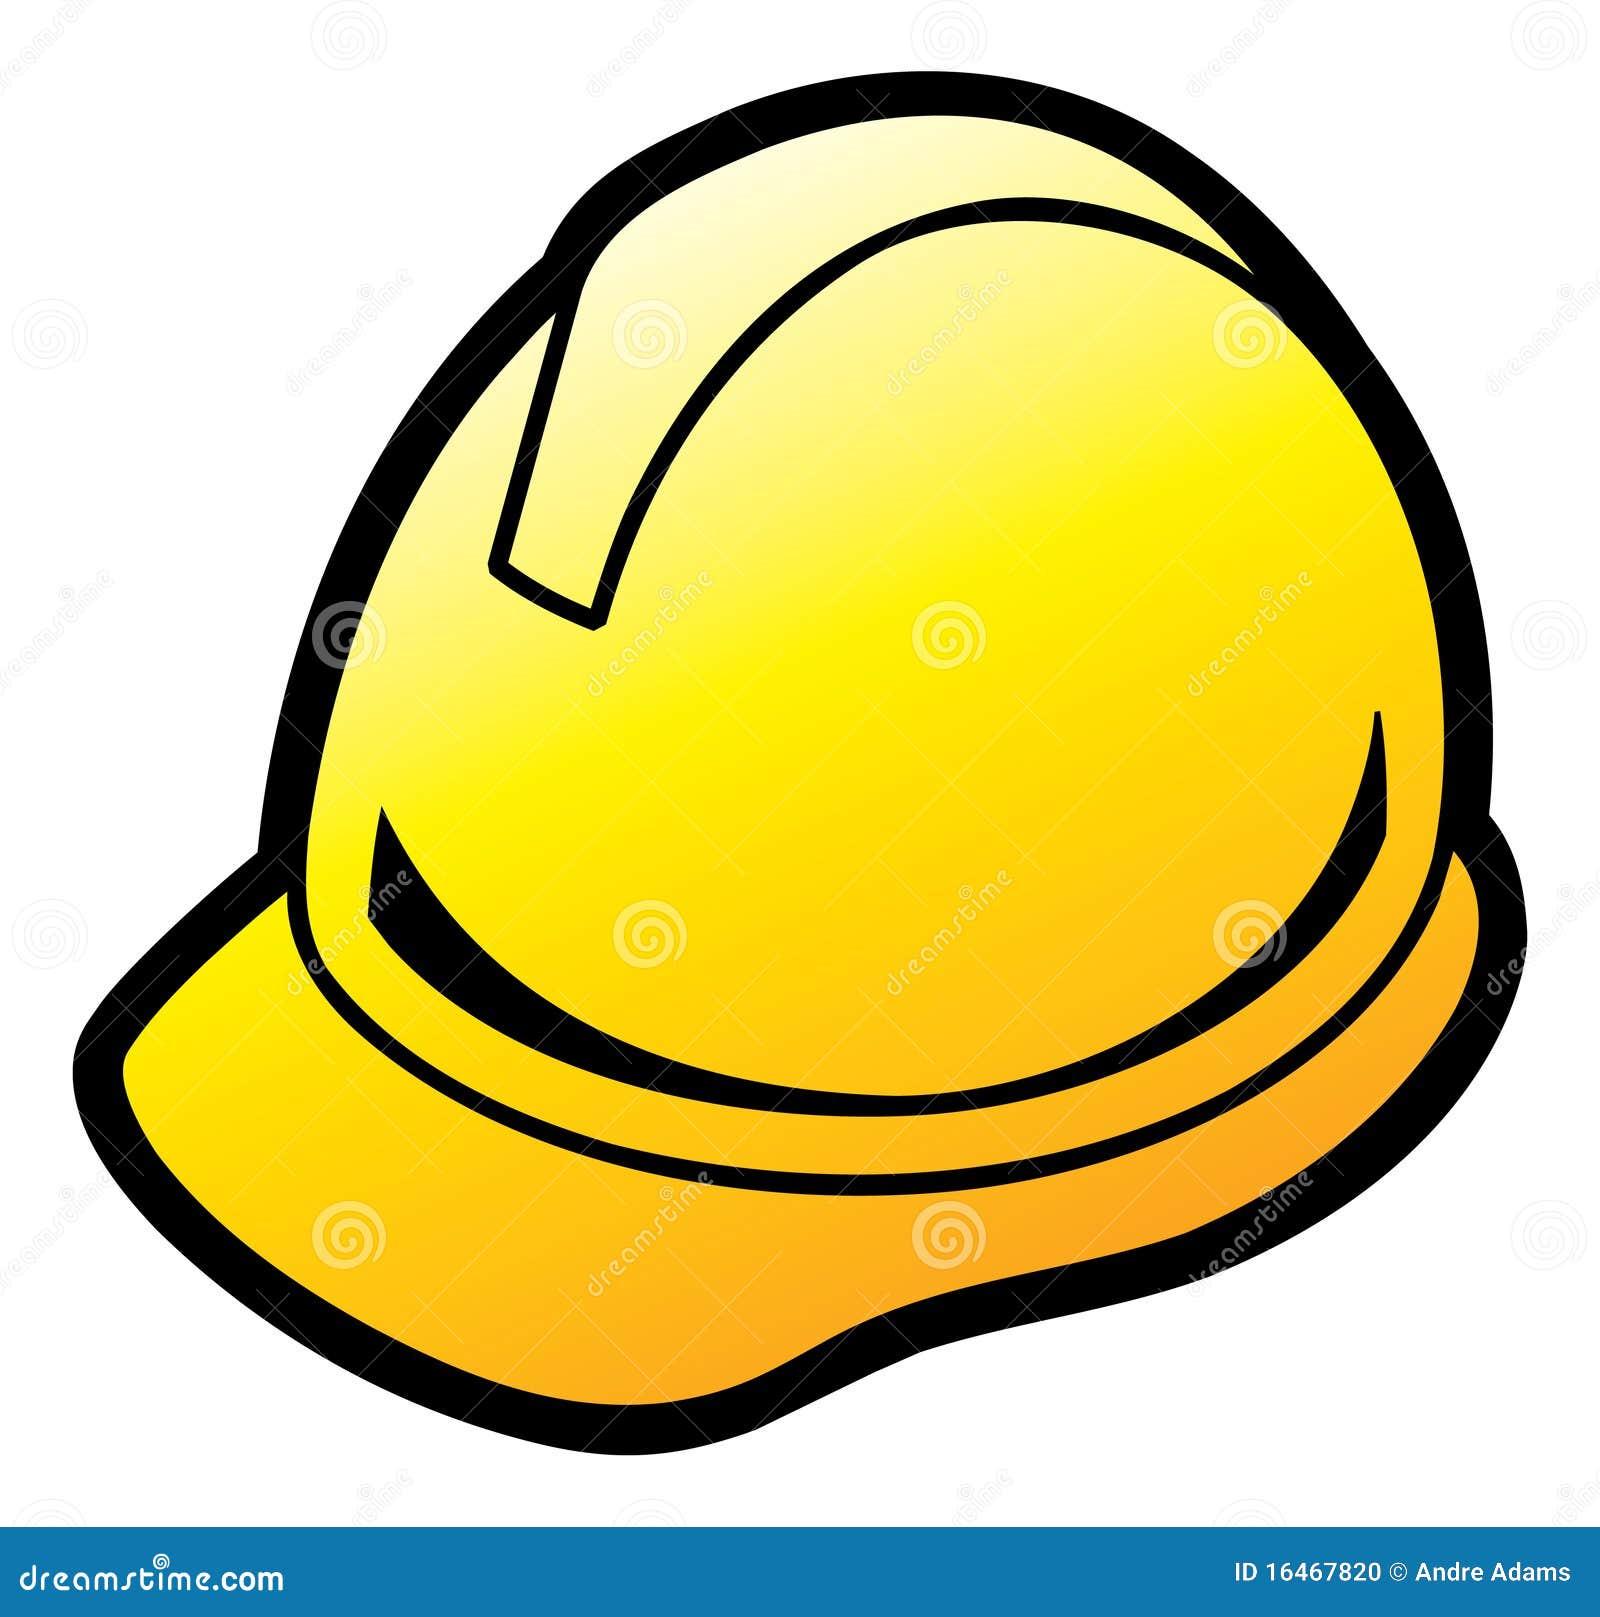 yellow hard hat clipart - photo #38